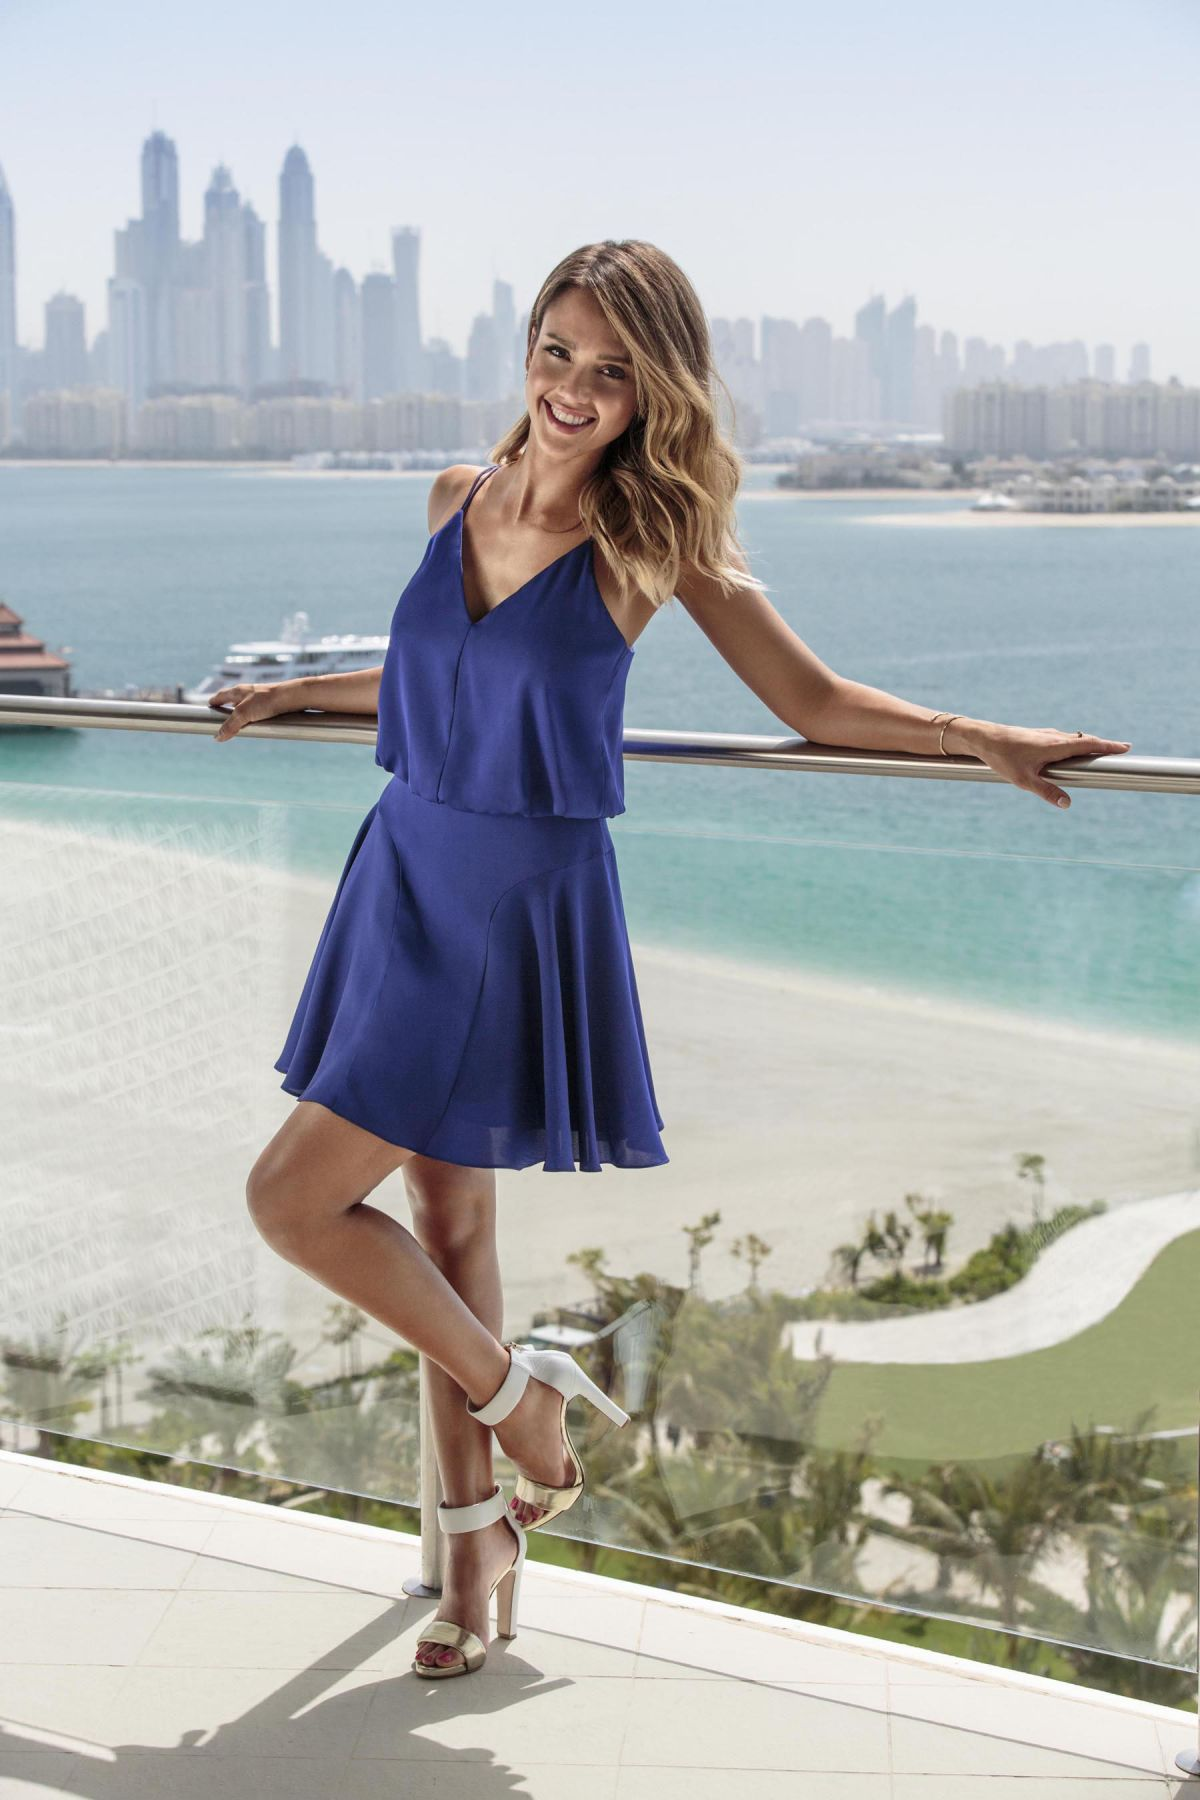 JESSICA ALBA for Cosmopolitan Magazine - HawtCelebs - HawtCelebs